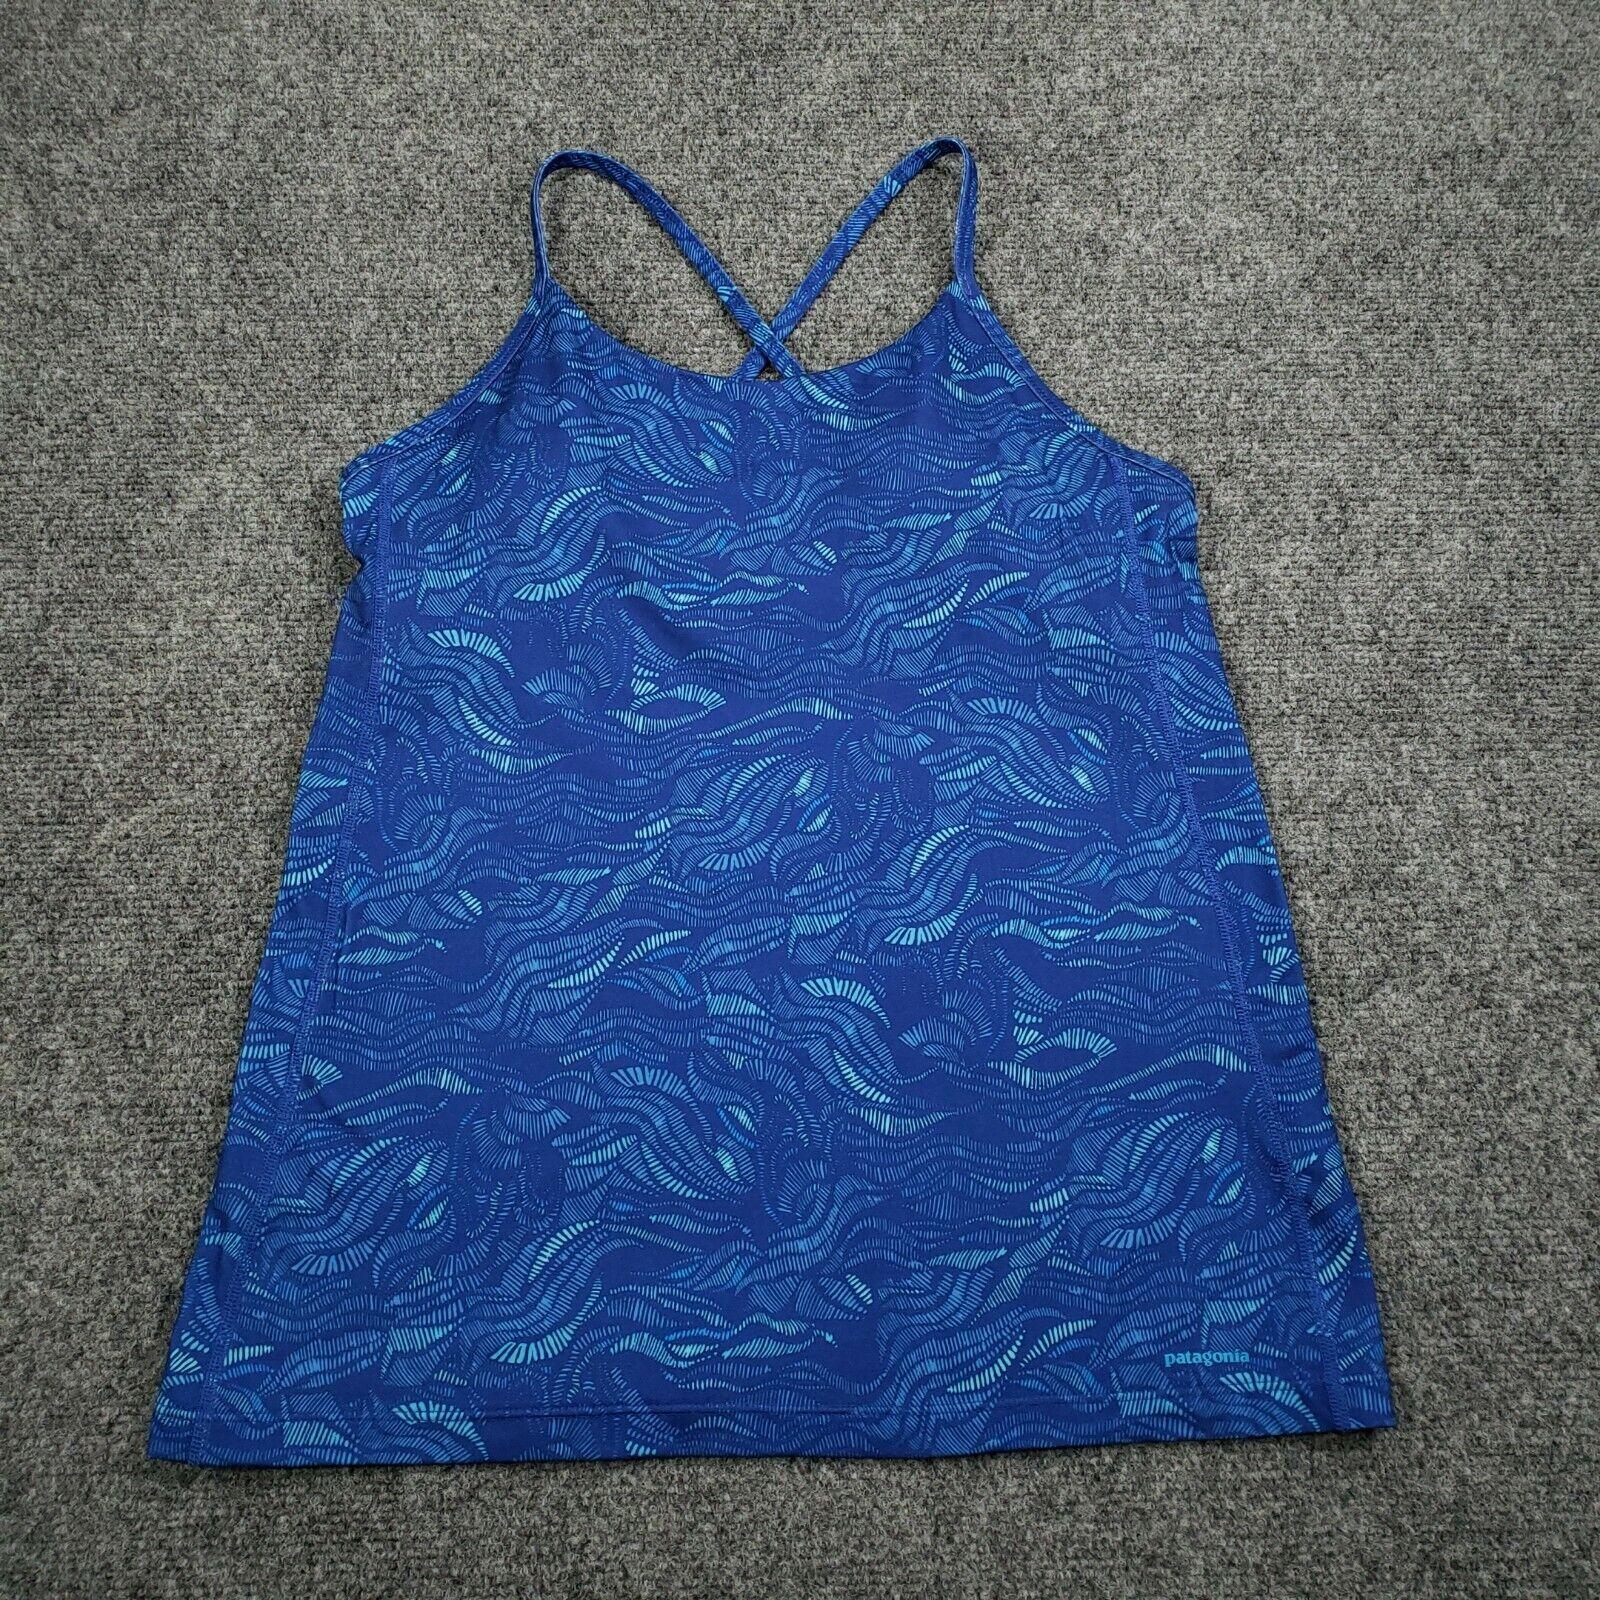 Patagonia Top M Medium Blue Tank Printed Scoop Neck Racerback Activewear Womens